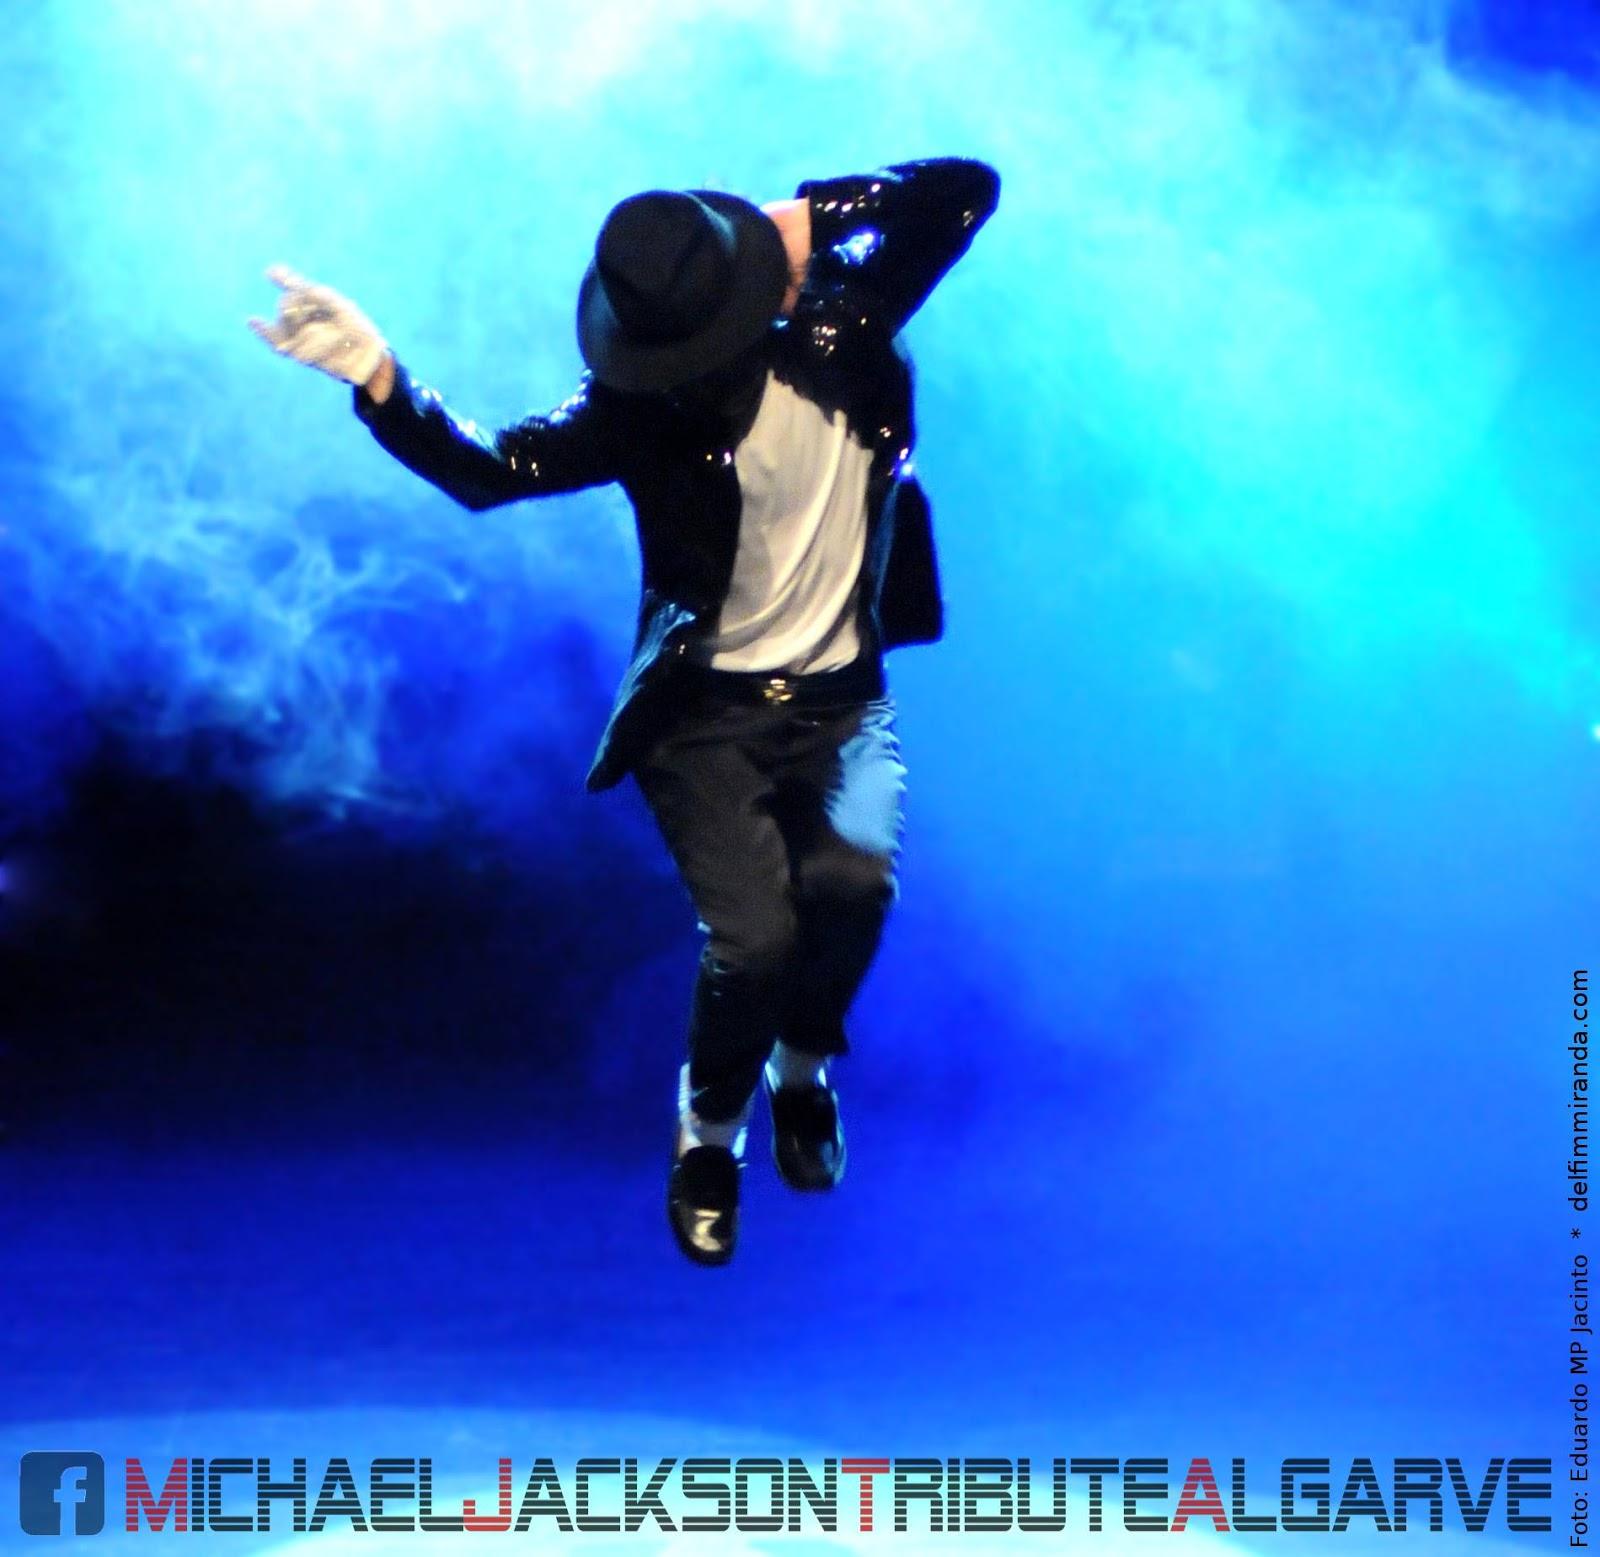 Delfim Miranda - Michael Jackson Tribute - Billie Jean square thumb